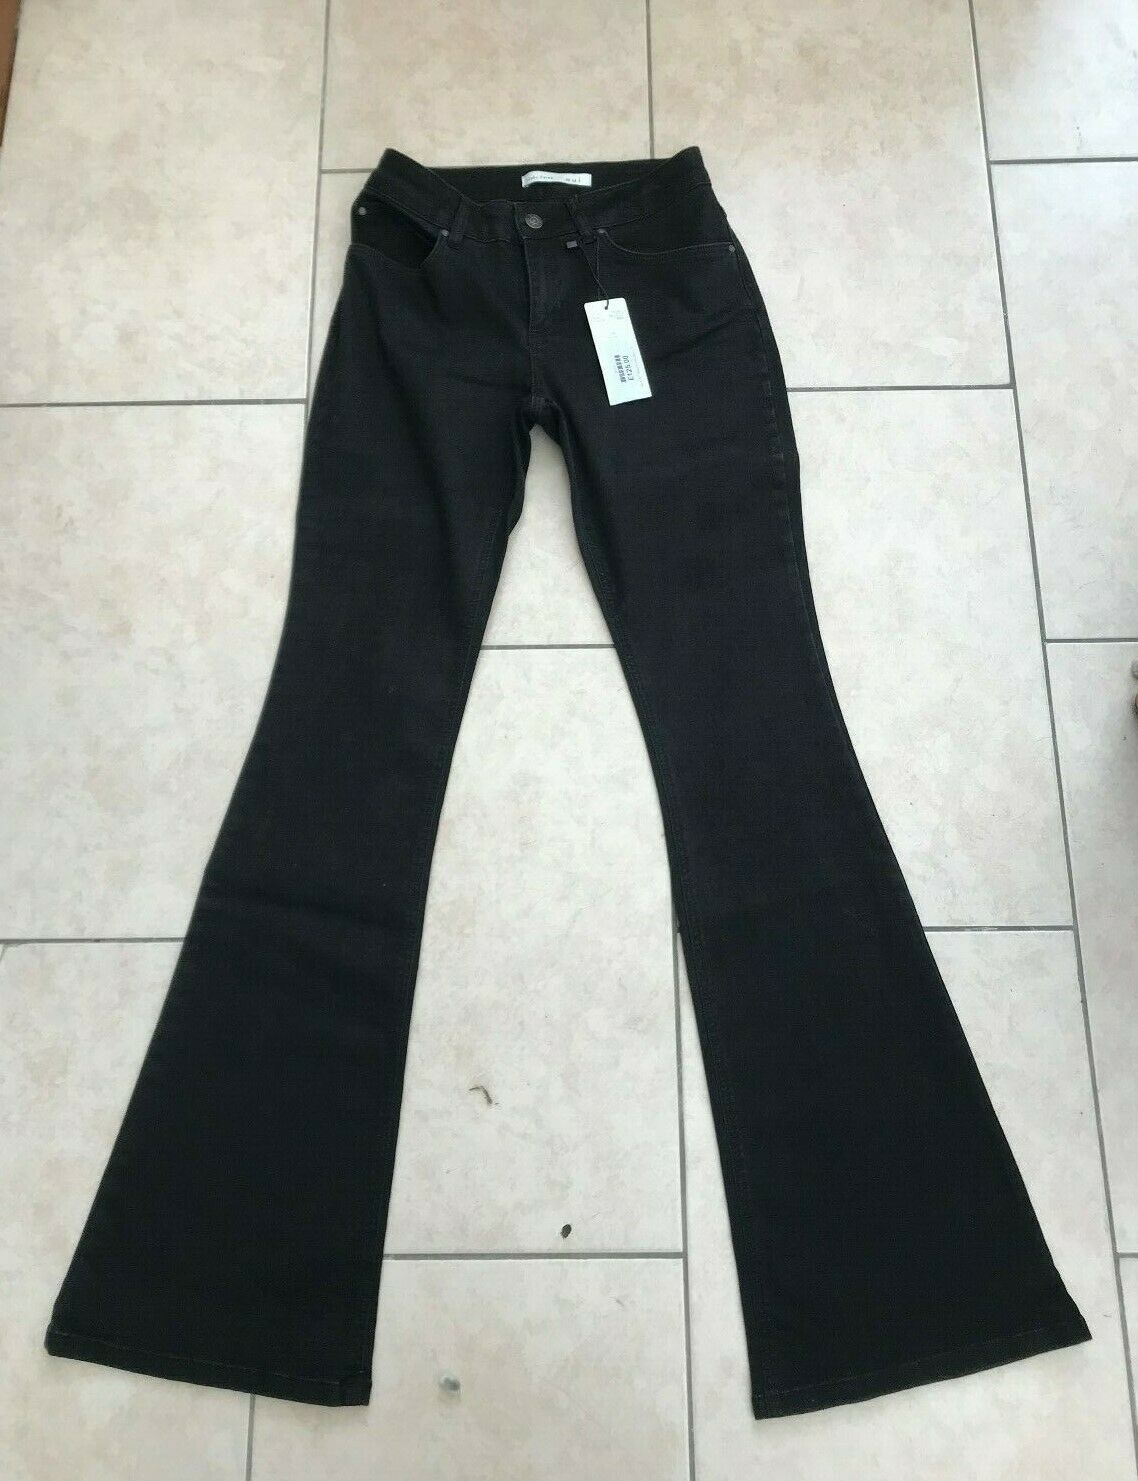 Oui schwarz Designer Crosby Flarot  Hipster High Waist Jeans Größe 8 EU34 L32 BNWT